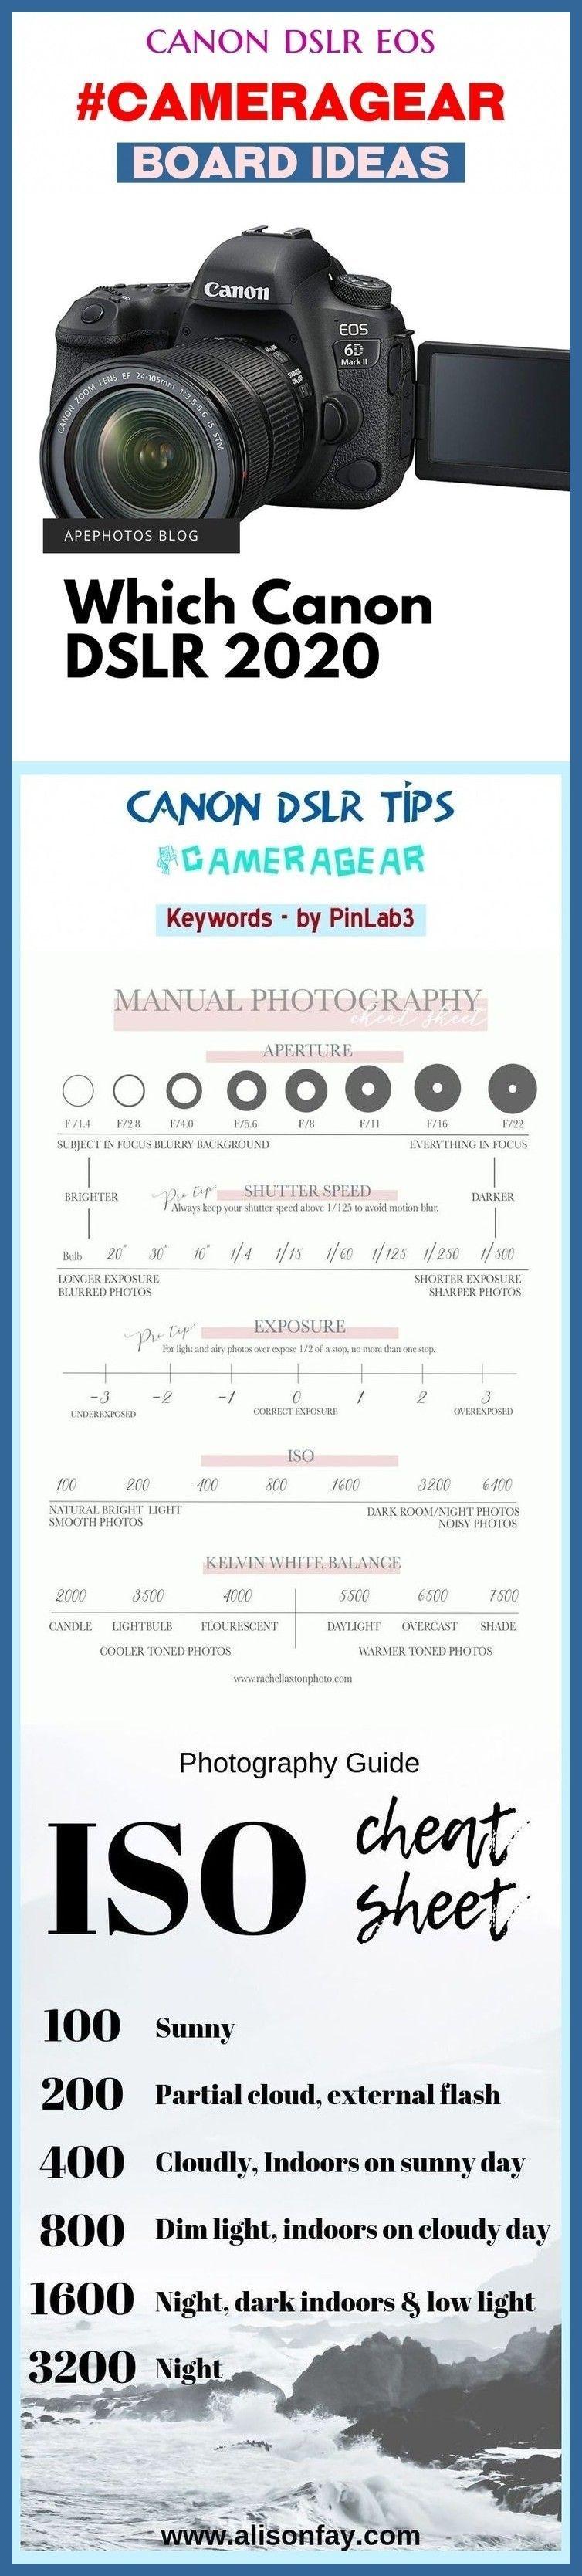 Wedding photography  #Canon #beginner Canon DSLR beginner, best Canon DSLR, Cano... -  Wedding photography  #Canon #beginner Canon DSLR beginner, best Canon DSLR, Canon DSLR pictures, Ca - #Beginner #Cano #Canon #Dslr #edgyStreetPhotography #modernStreetPhotography #photography #StreetPhotographyarchitecture #StreetPhotographyinstagram #StreetPhotographynewyork #StreetPhotographyperspective #StreetPhotographyrain #StreetPhotographyroads #StreetPhotographywallpaper #StreetPhotographywinter #toky